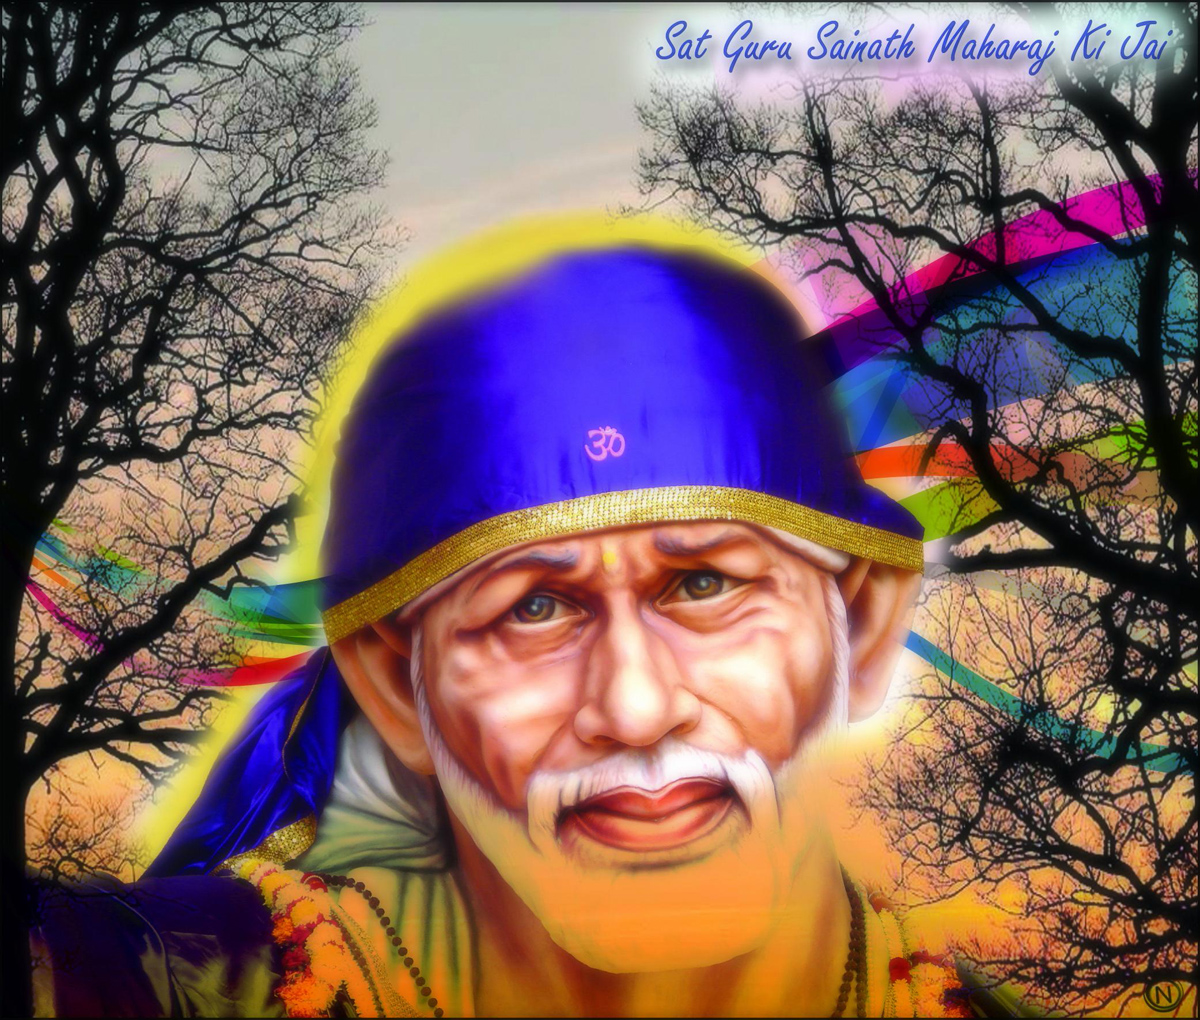 http://1.bp.blogspot.com/-ApD43uc_blE/Te2hldOEBlI/AAAAAAAAPKo/X0ti3W_mjzk/s1600/saibaba1.jpg